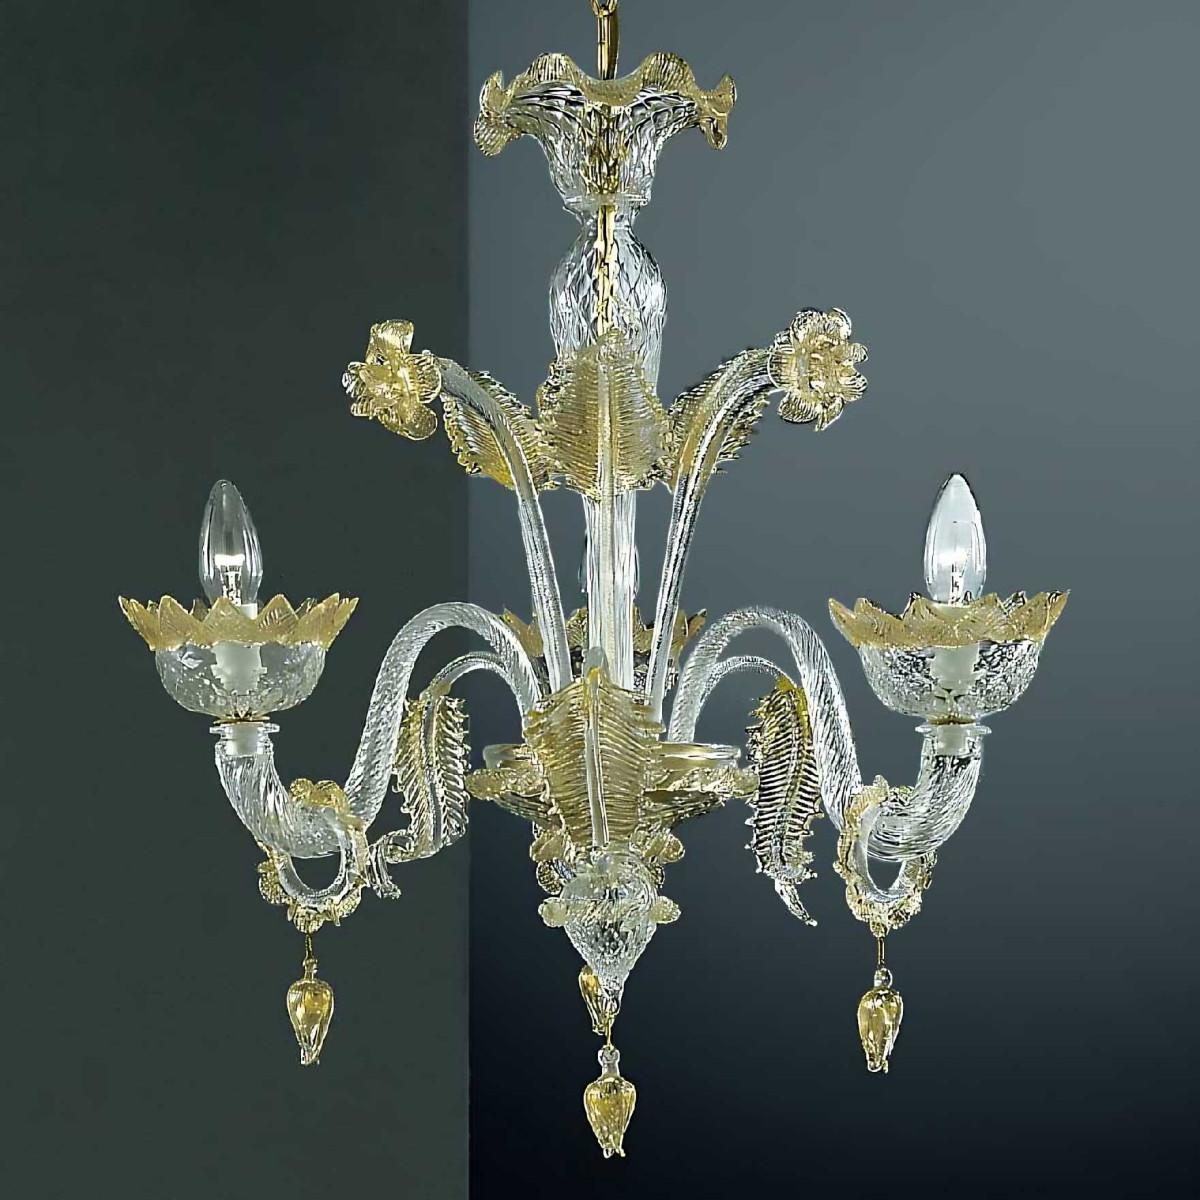 Casanova ara a peque a de cristal de murano con anillos murano glass chandeliers - Anillo cristal murano ...